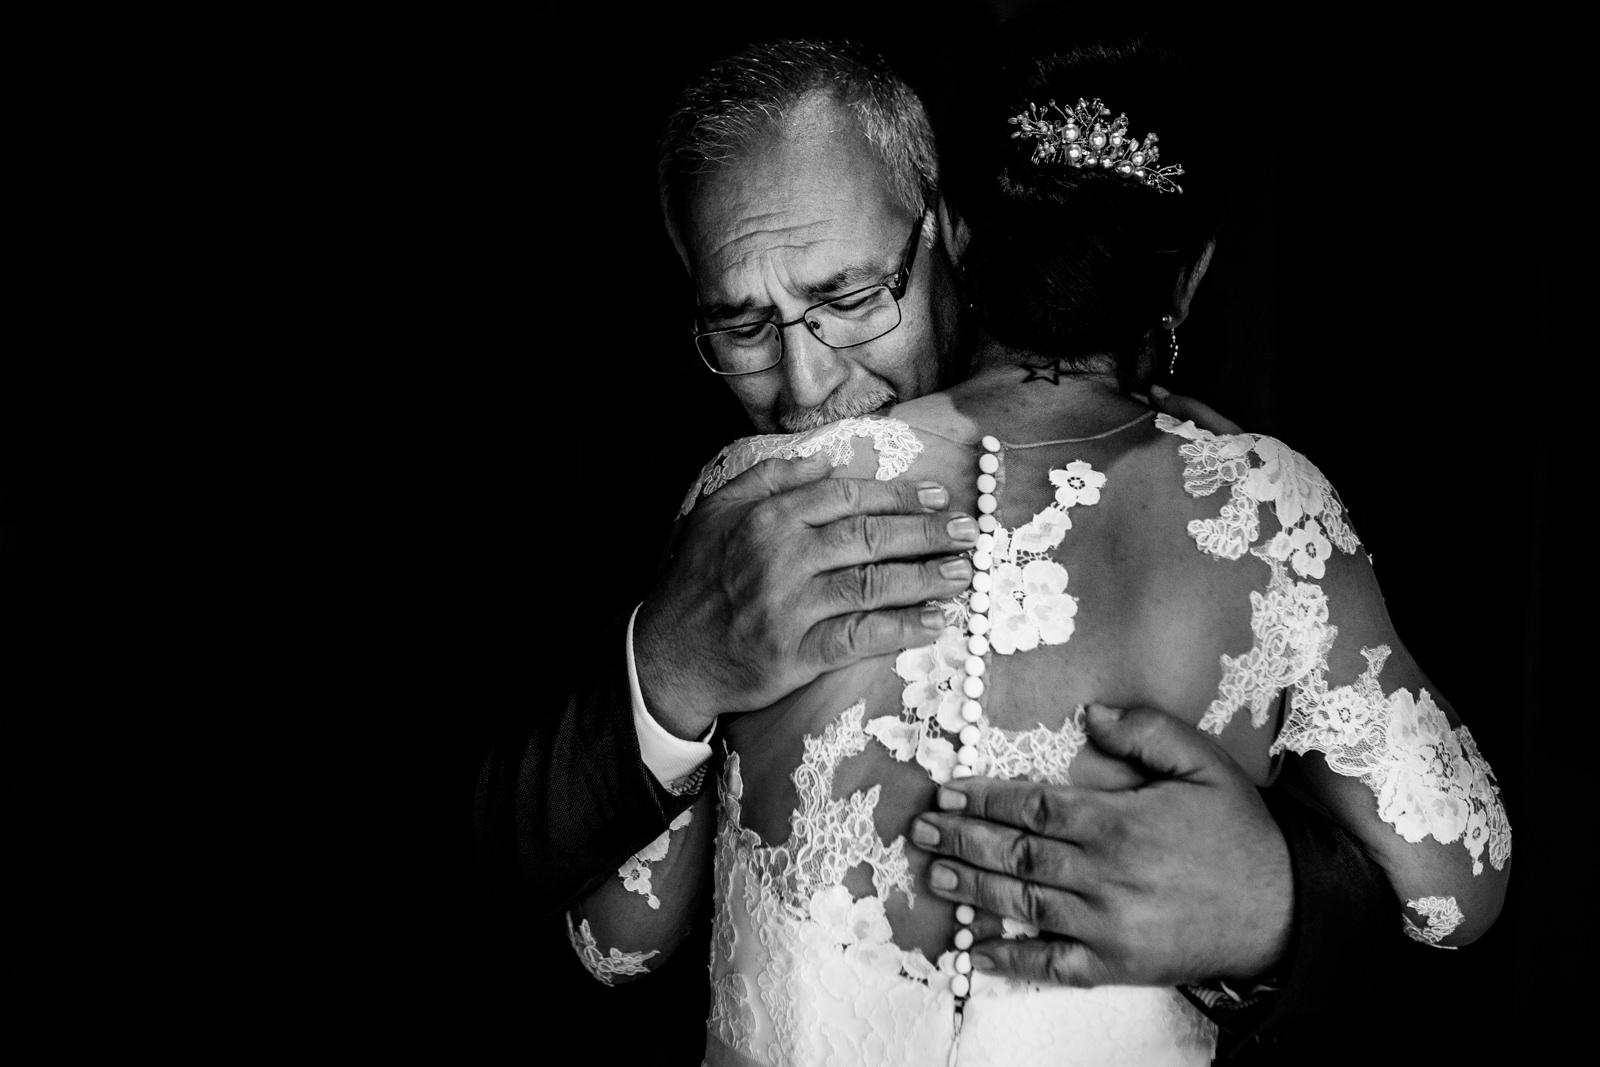 Almirall-Font-sitges-marbella-engagement-Rafael-Torres-fotografo-bodas-sevilla-madrid-barcelona-wedding-photographer--26.jpg